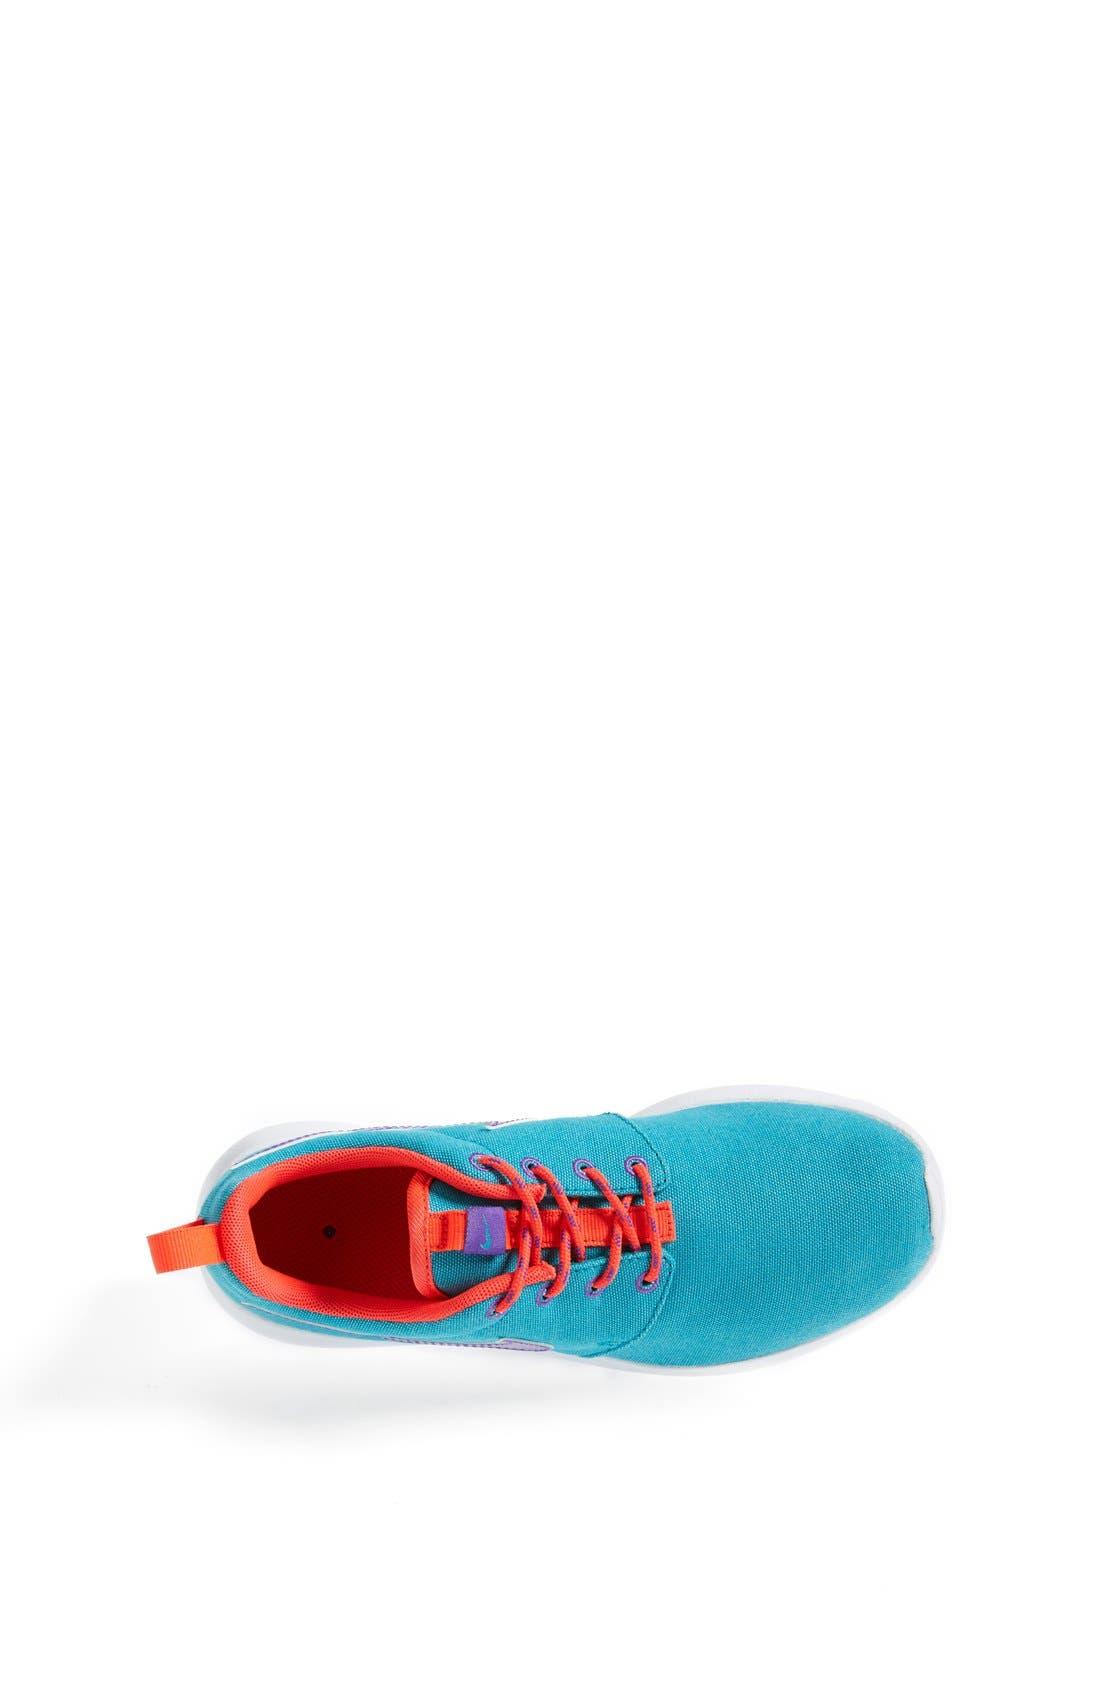 'Roshe Run' Athletic Shoe,                             Alternate thumbnail 163, color,